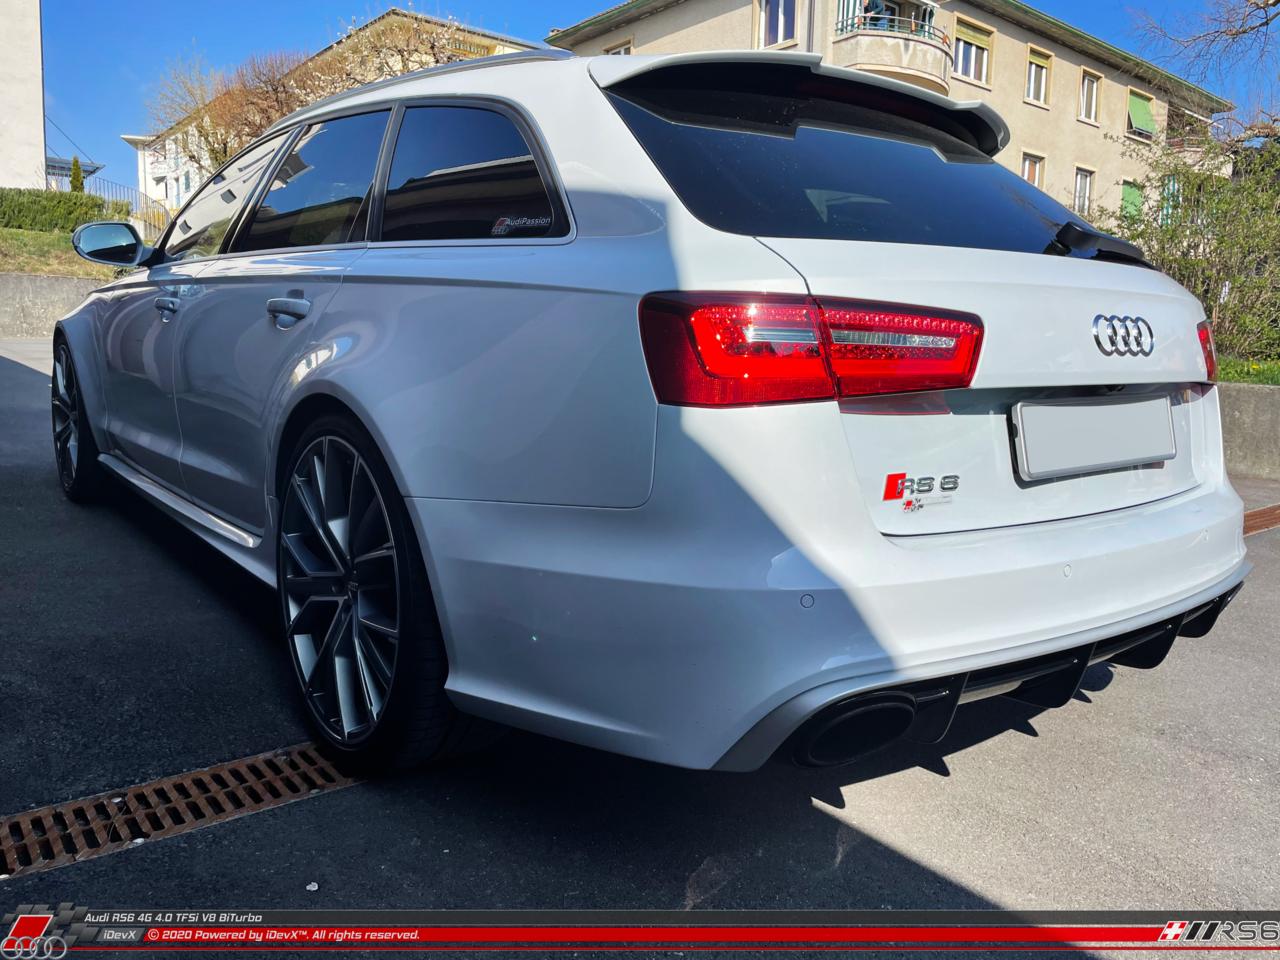 03.04.2021_Audi-RS6_iDevX_010.png